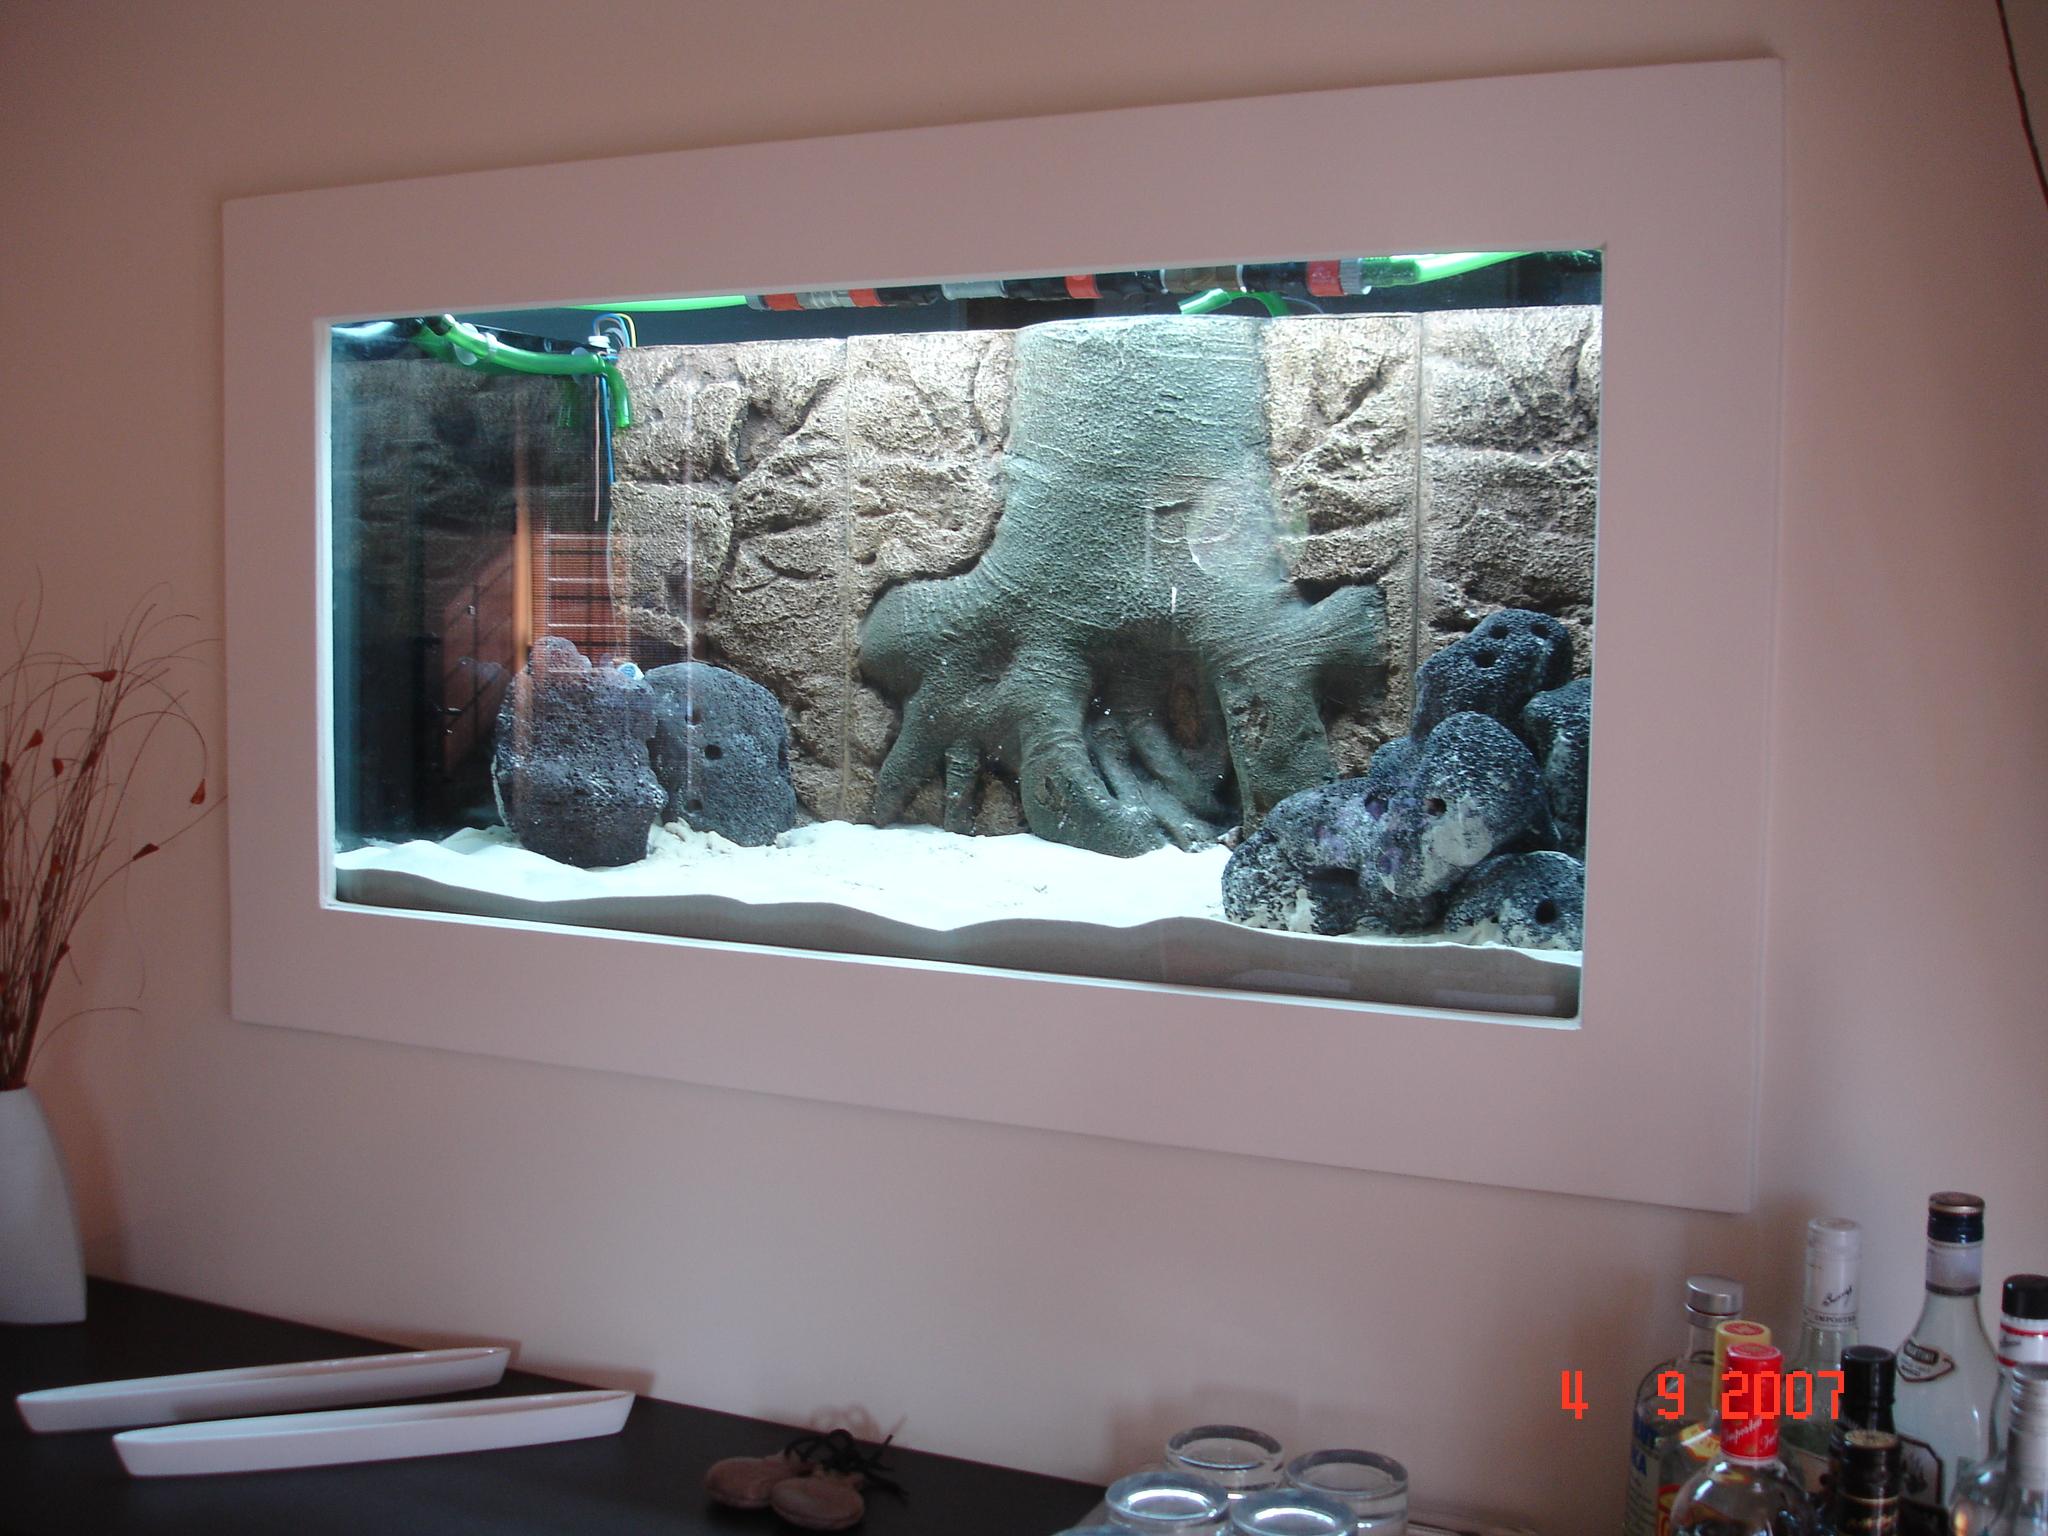 how to set up a cichlid breeding tank